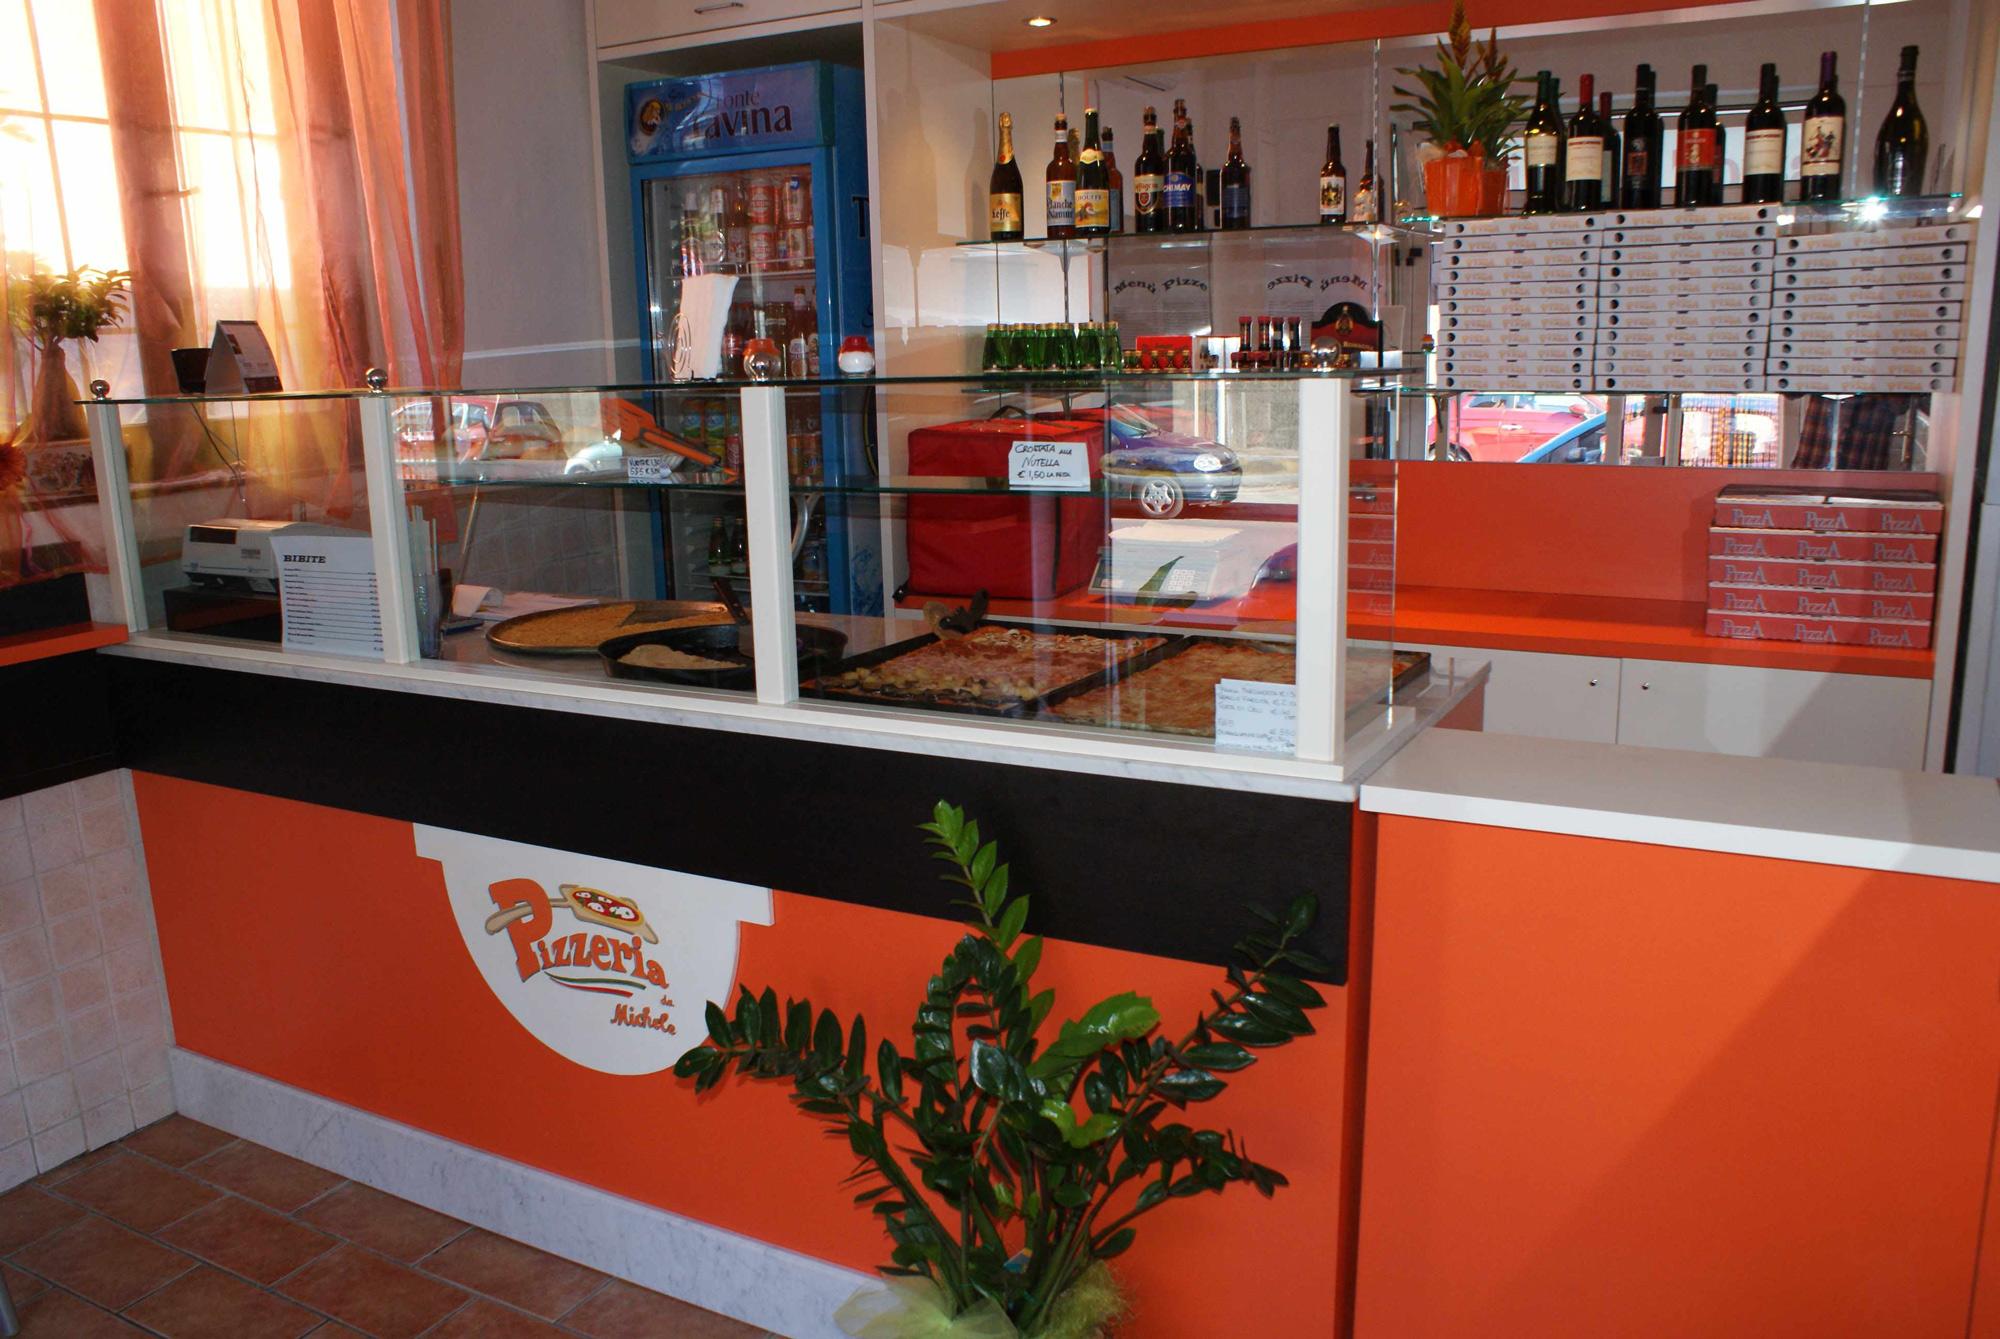 Arredamento per bar e pizzerie toscana belardi arredamenti for Arredamento bari